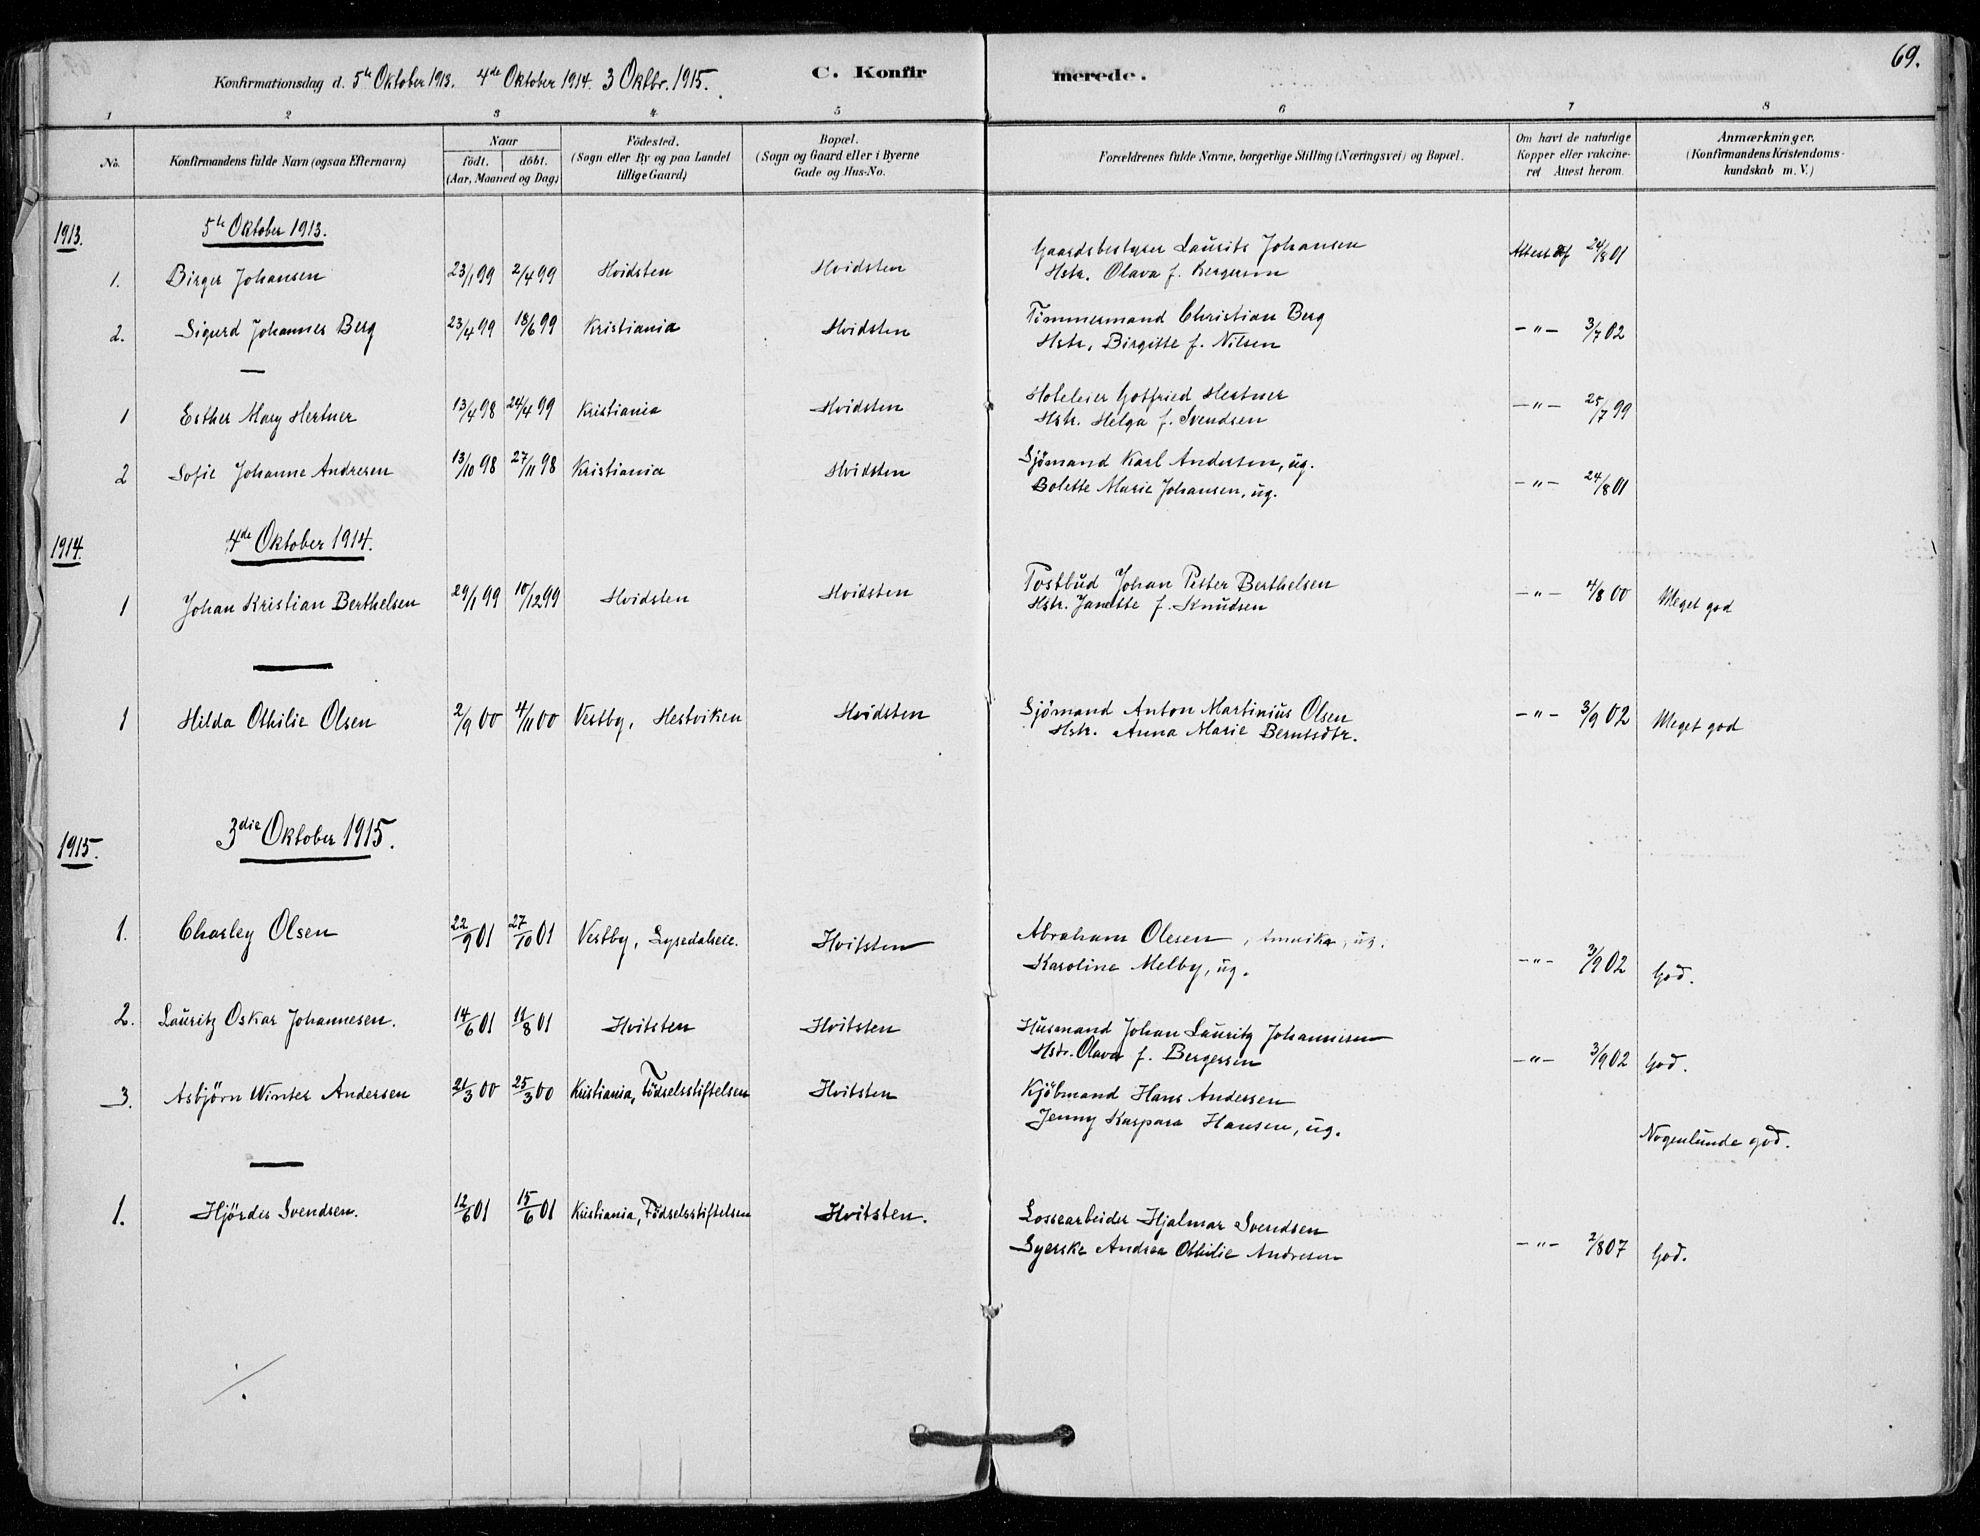 SAO, Vestby prestekontor Kirkebøker, F/Fd/L0001: Ministerialbok nr. IV 1, 1878-1945, s. 69